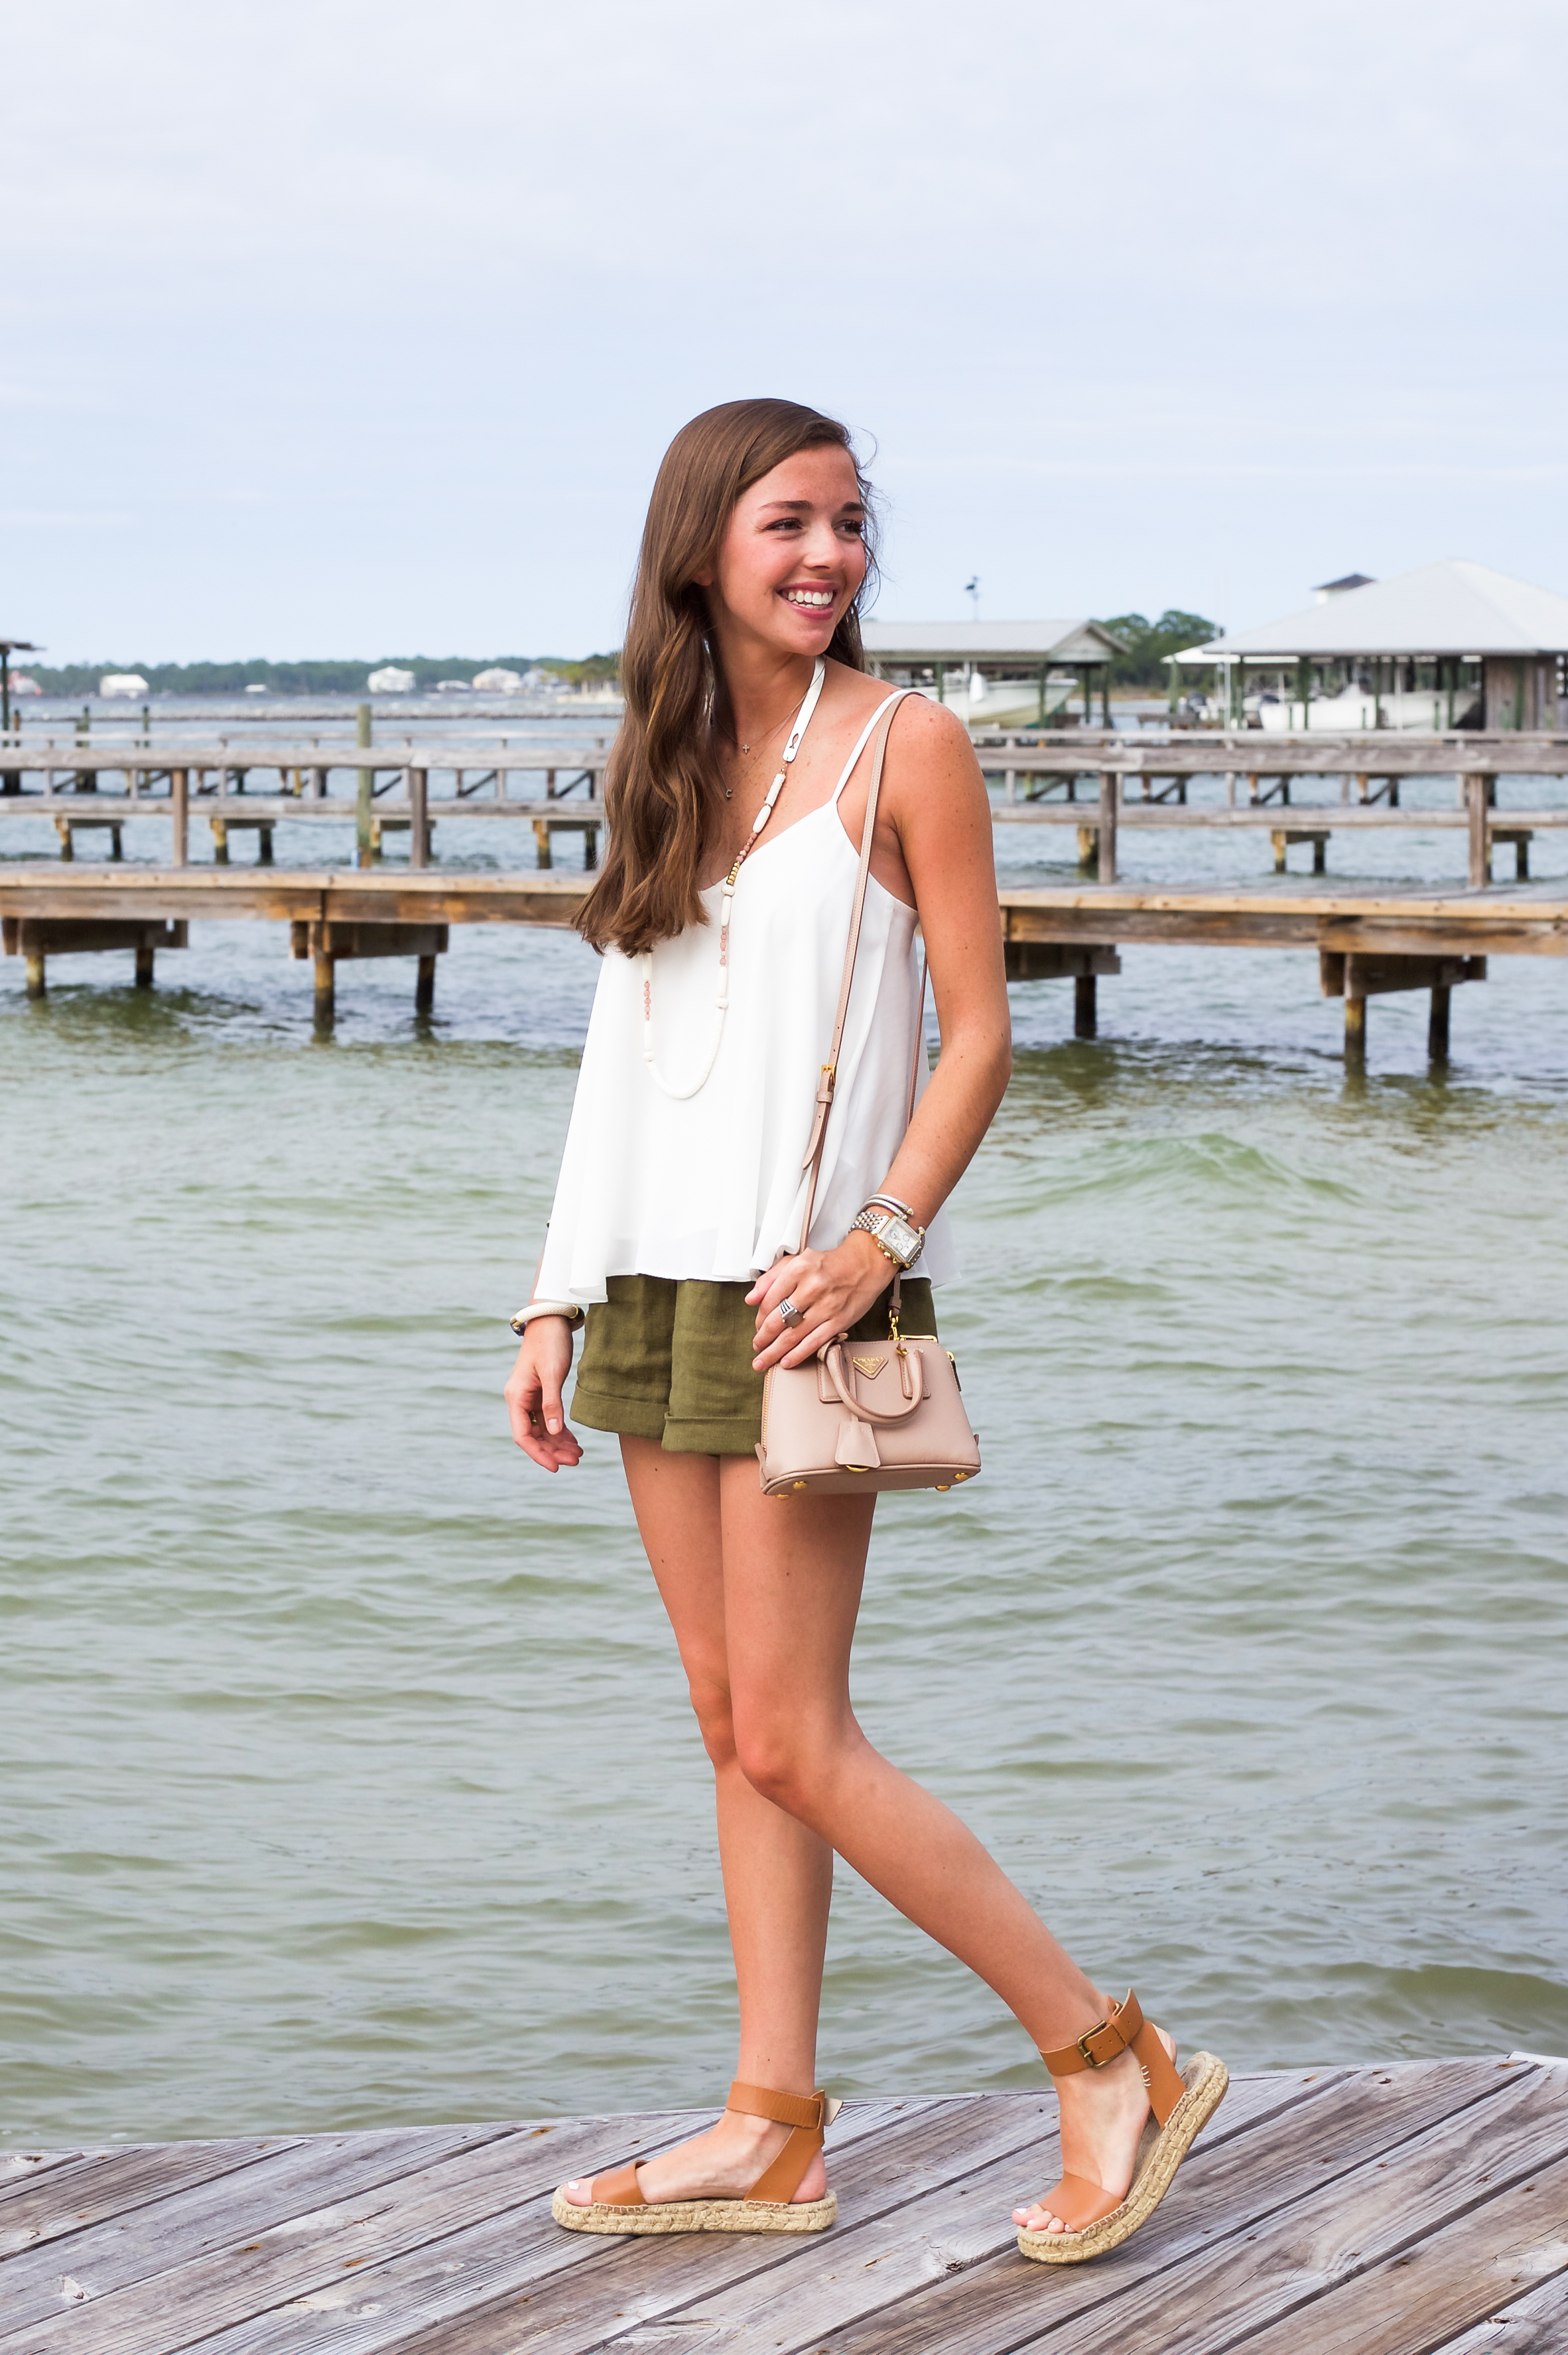 fashion blogger lcb style beach soludos topshop (11 of 21).jpg